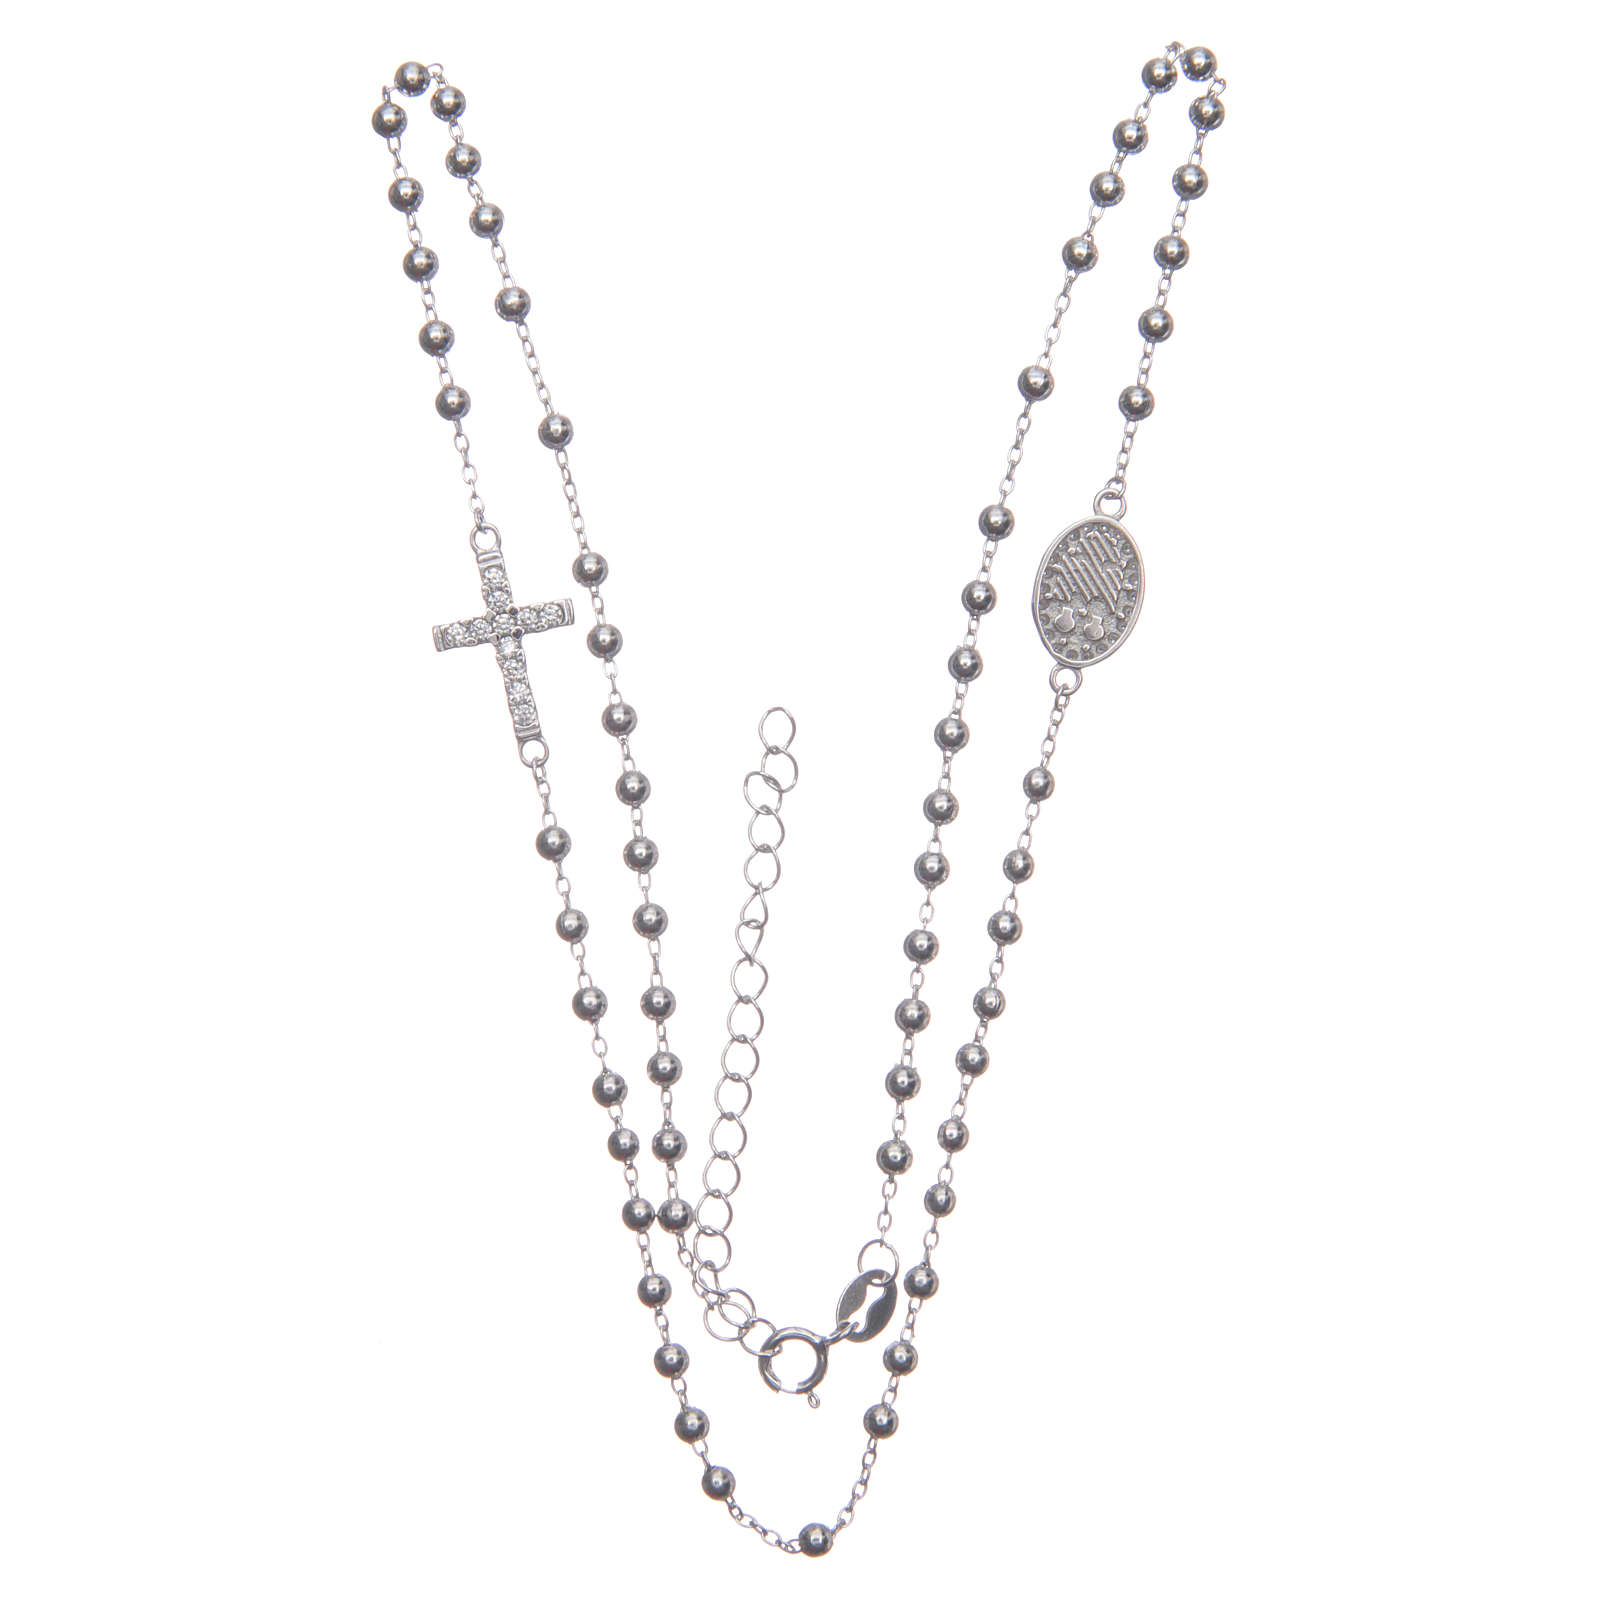 Rosario girocollo Santa Rita silver zirconi bianchi argento 925 4